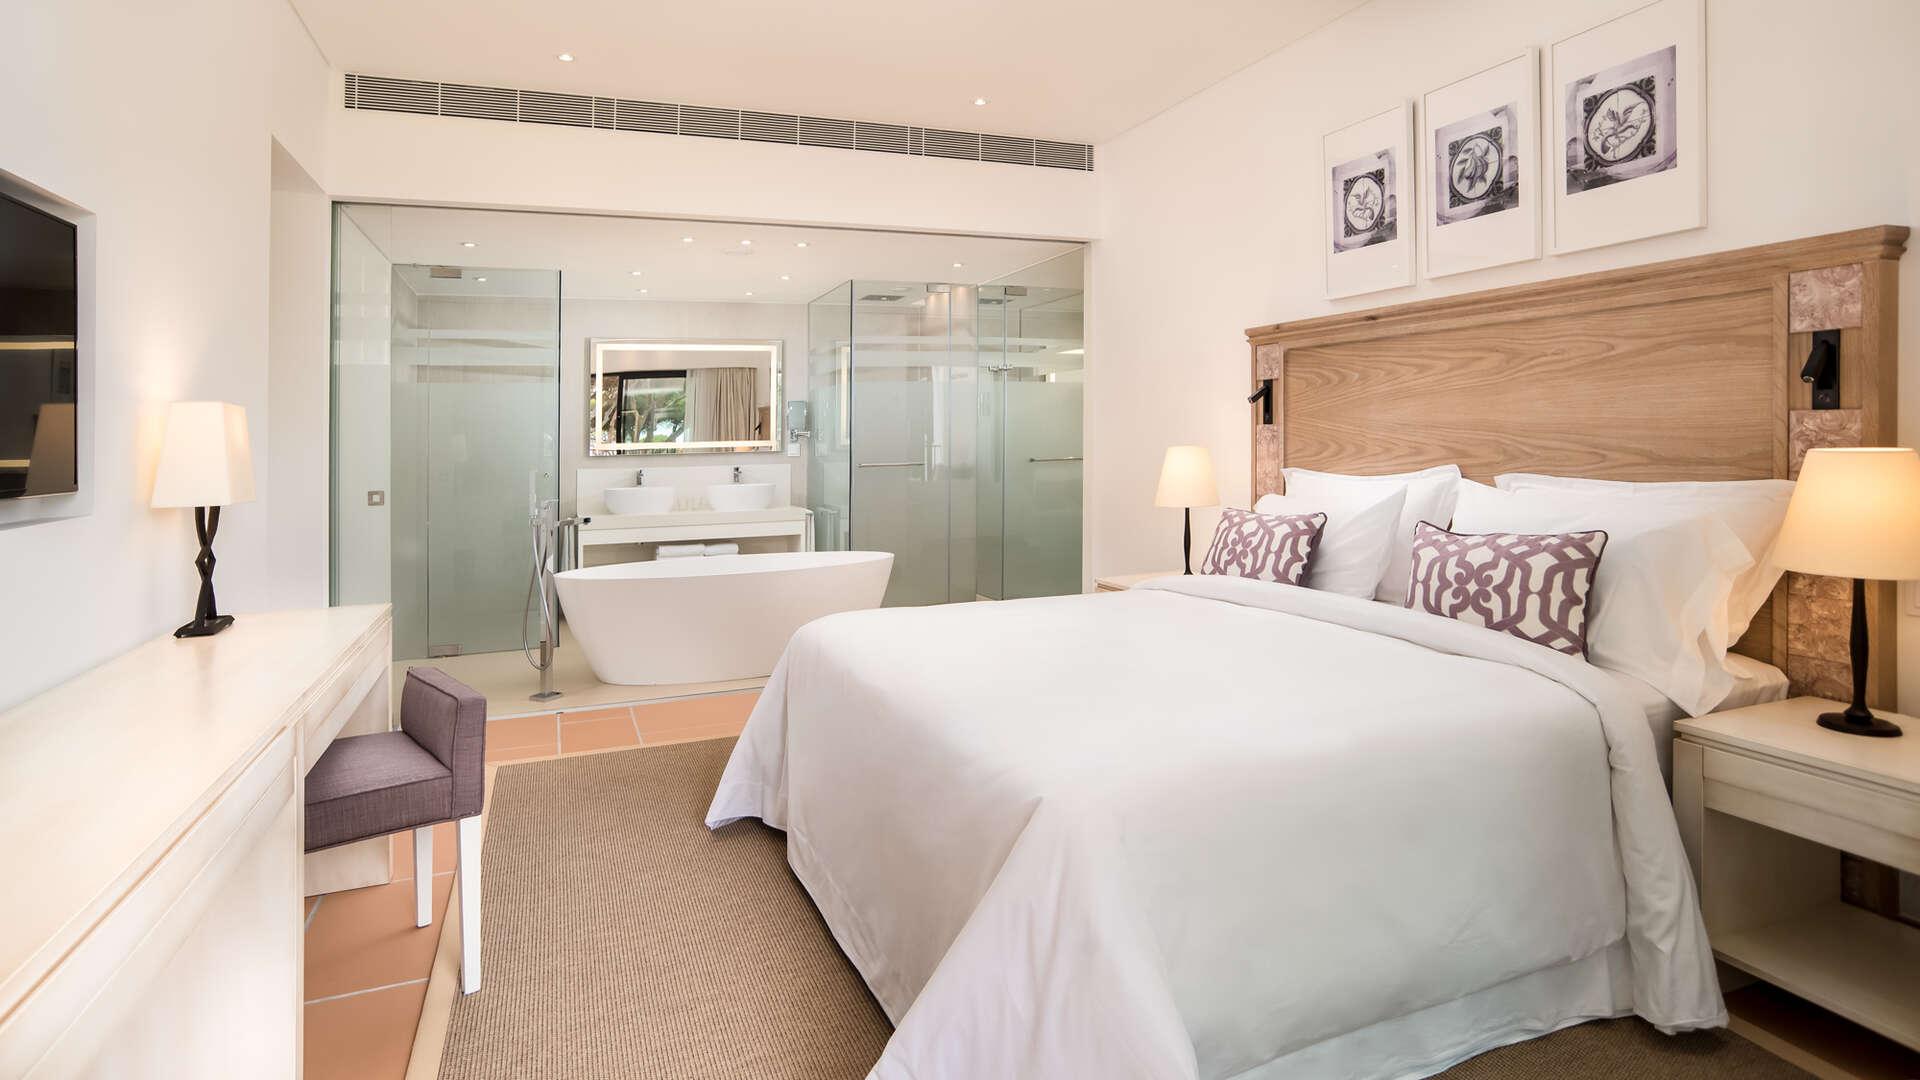 Luxury vacation rentals europe - Portugal - Algarve - Pine cliffs resort - Marriott 1 BDM Residential - Image 1/36